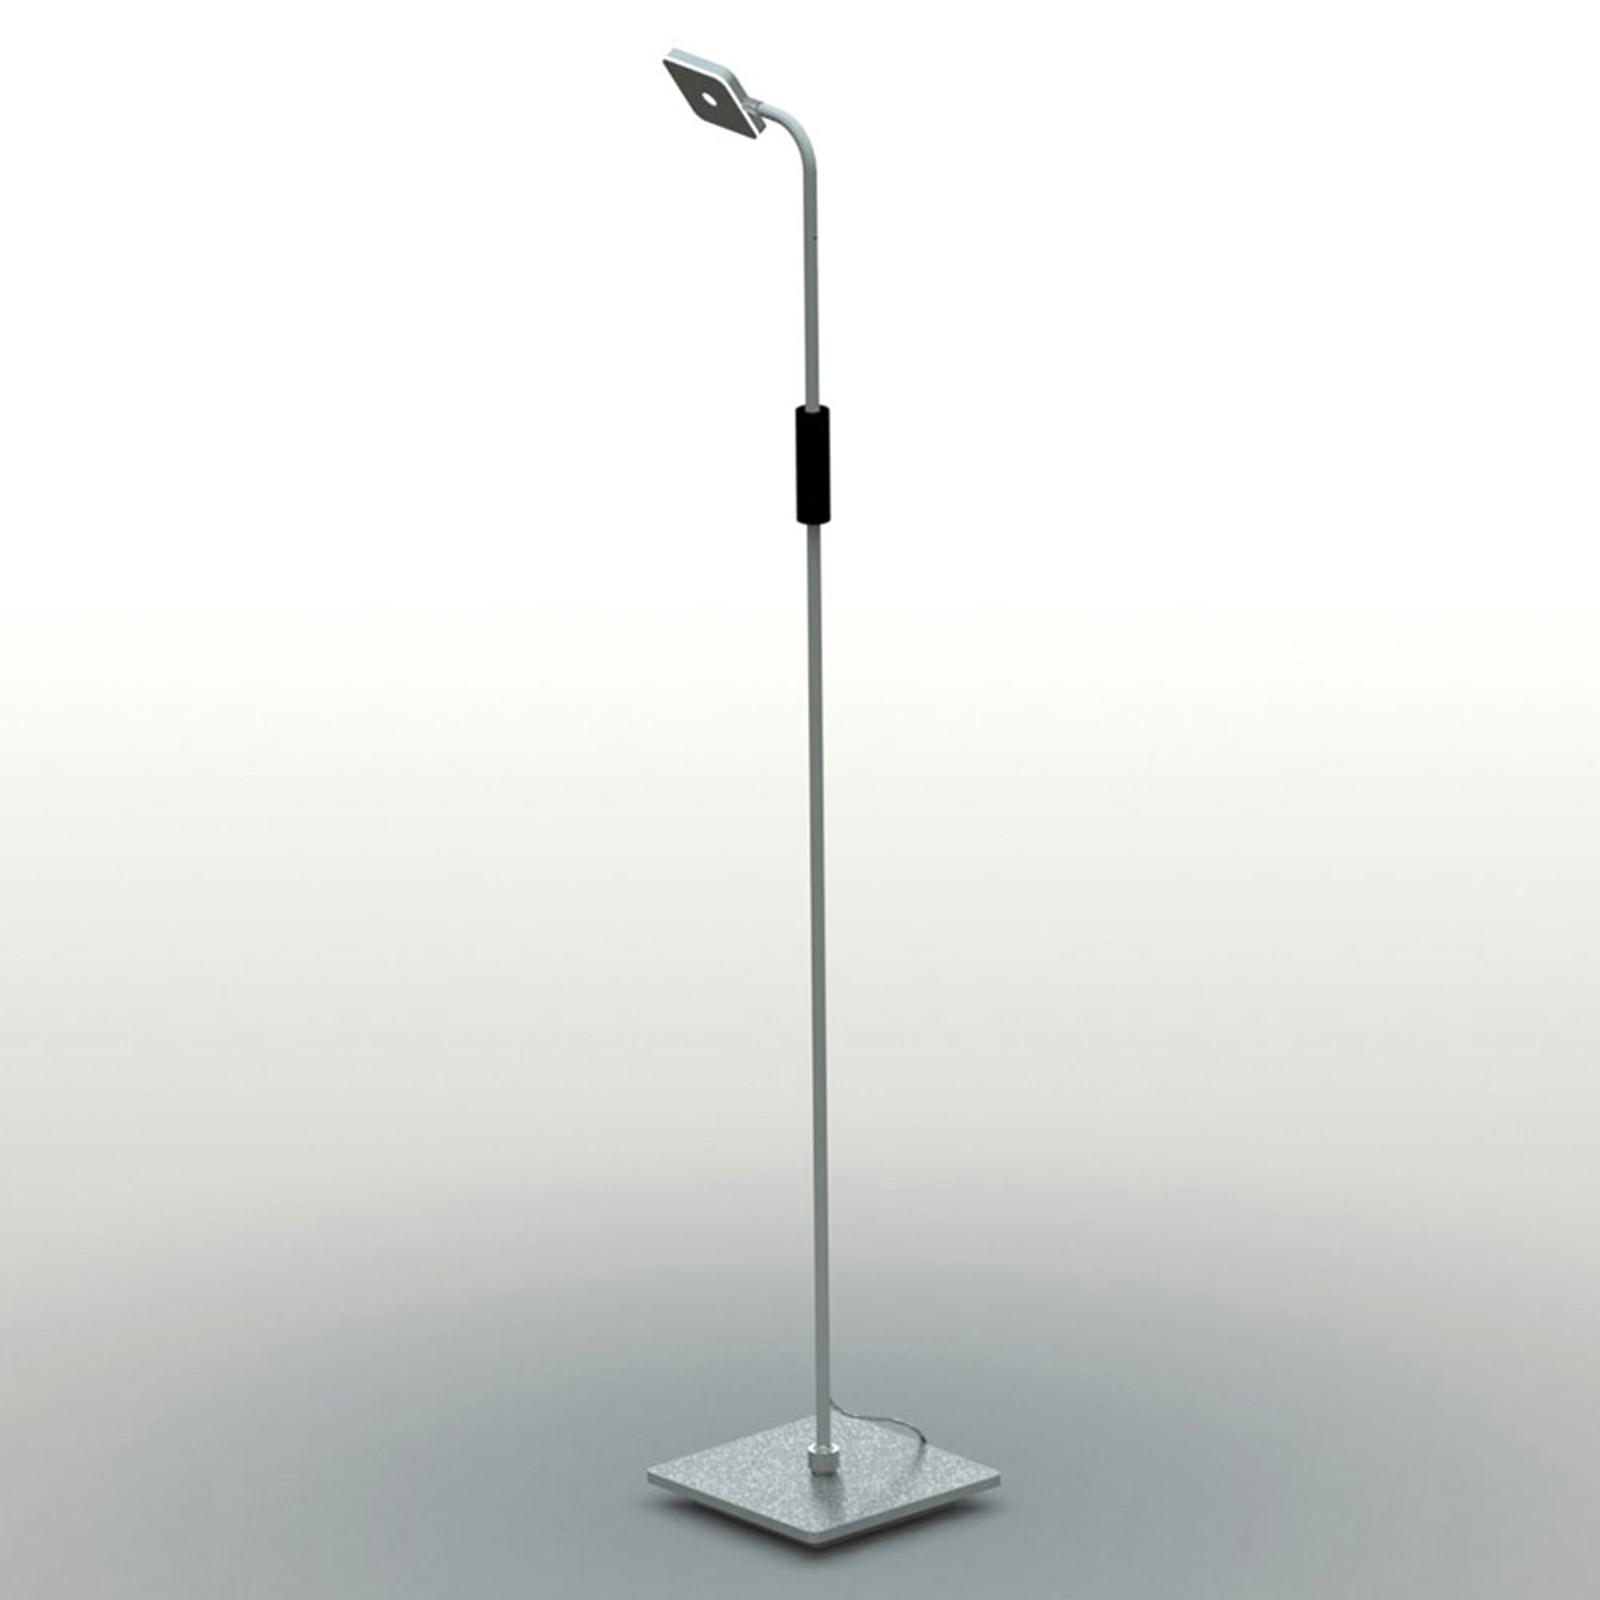 Bopp Move - LED vloerlamp met accu, aluminium